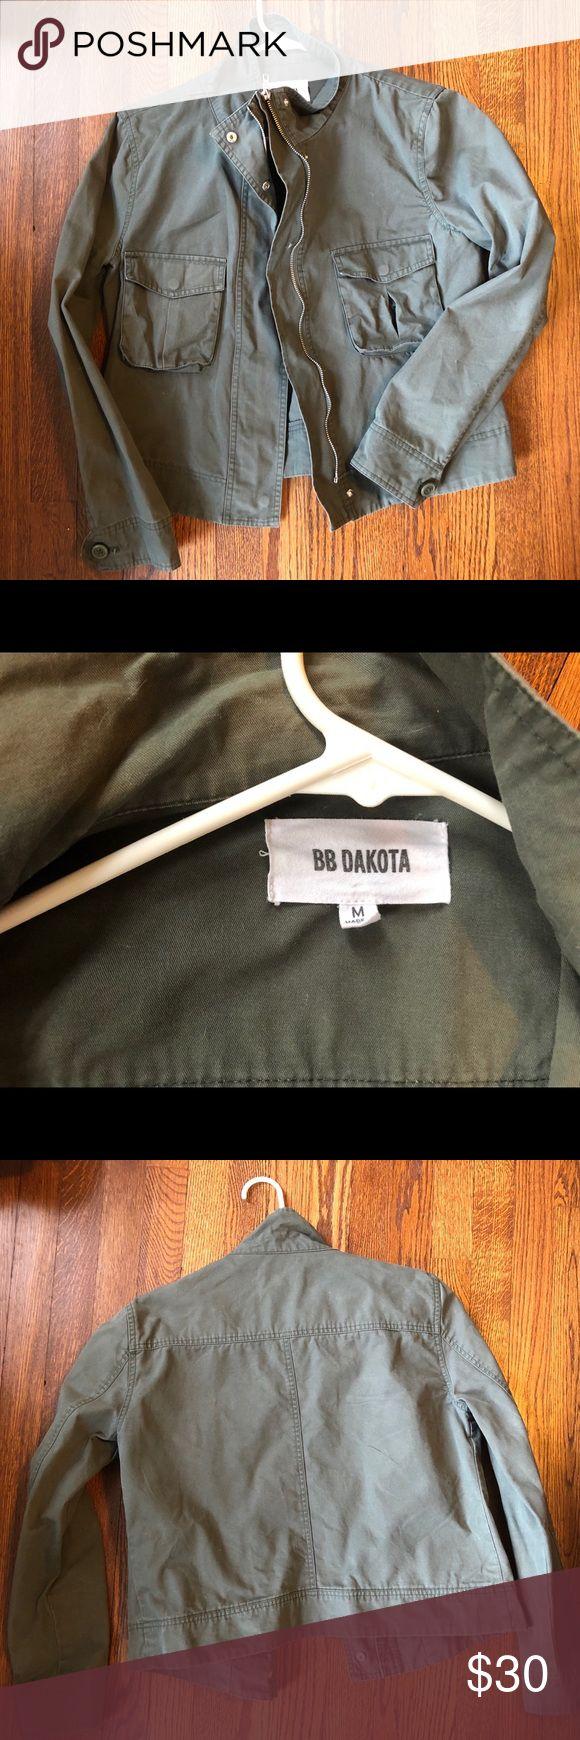 B.B. Dakota army style jacket Stylish army/military style jacket - bought off Shopbop - great condition BB Dakota Jackets & Coats